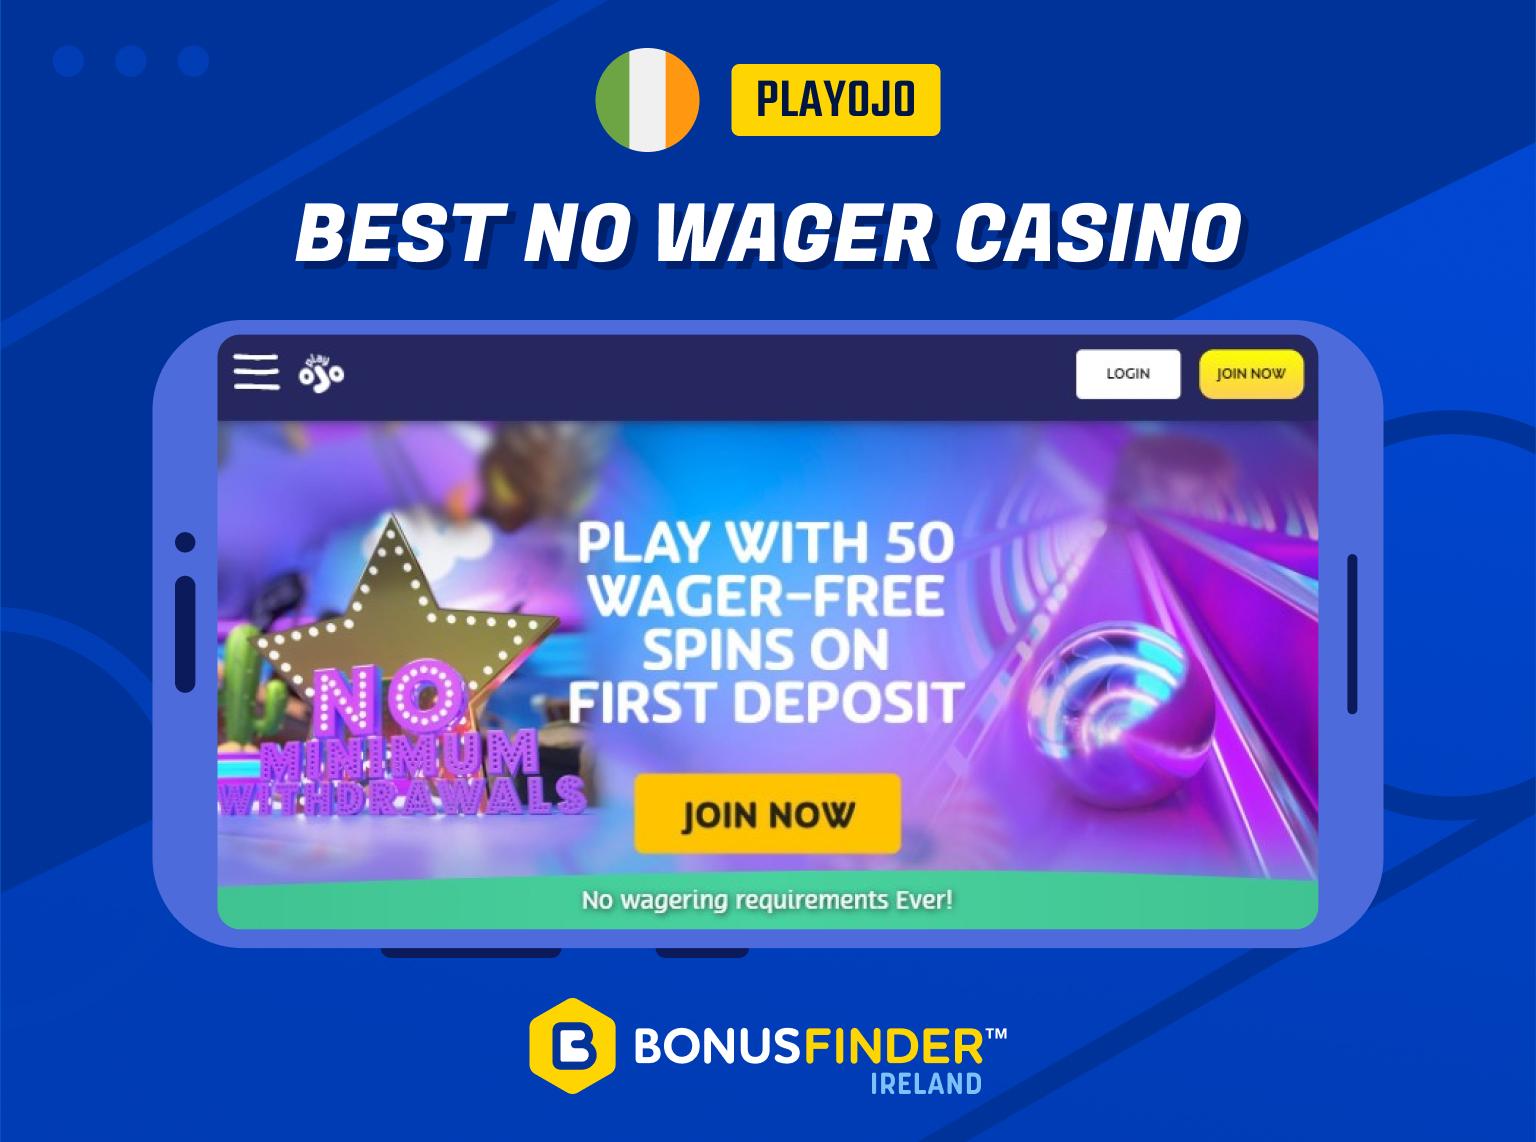 best no wager casino ireland